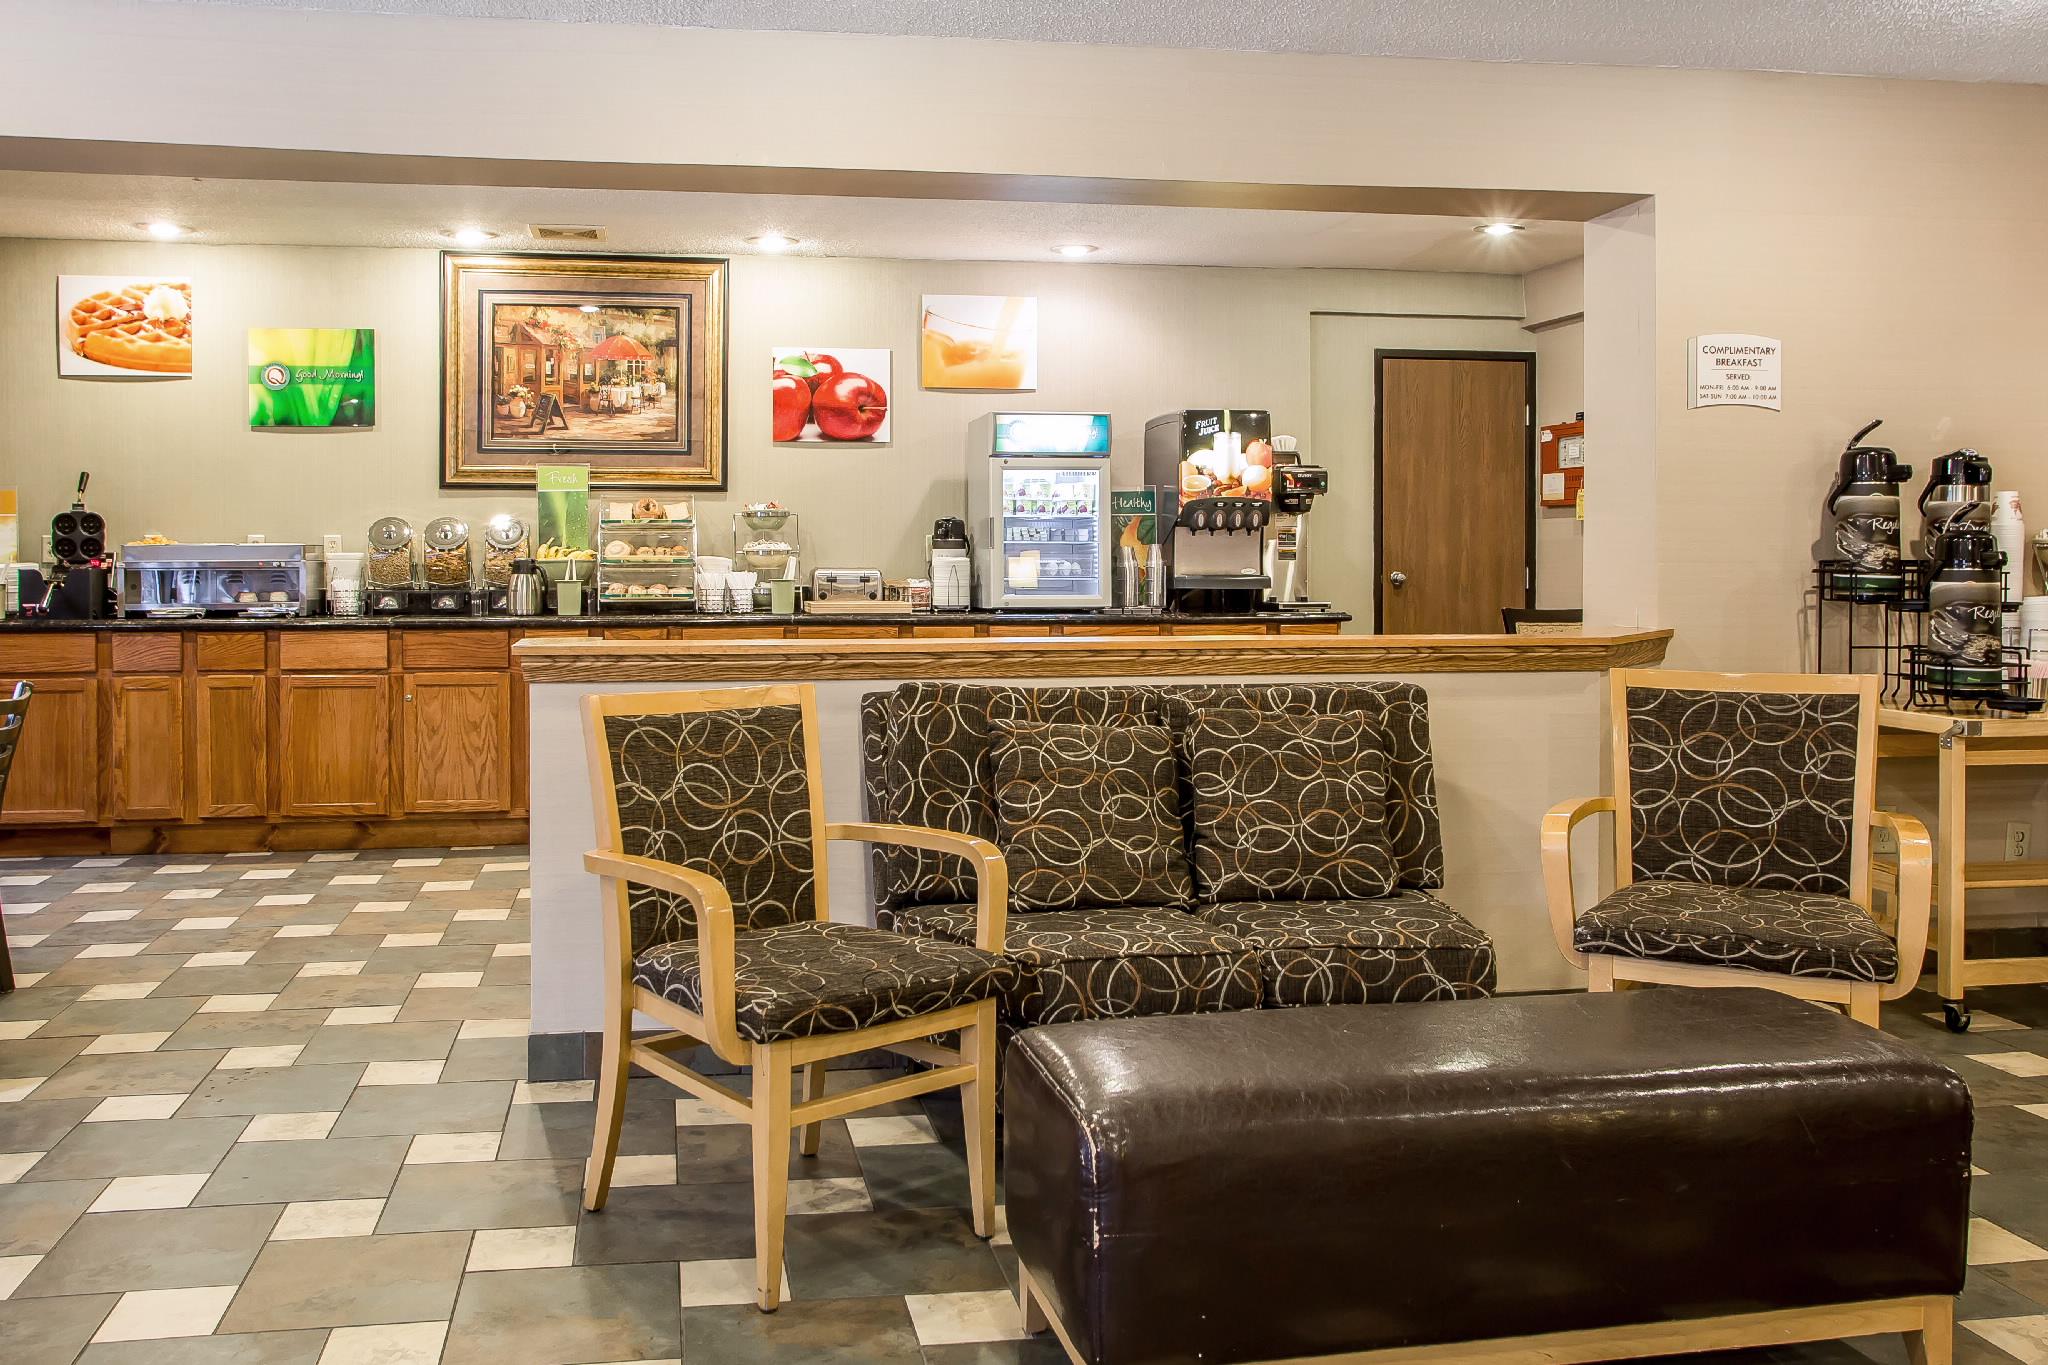 Quality Inn & Suites, Marinette WI